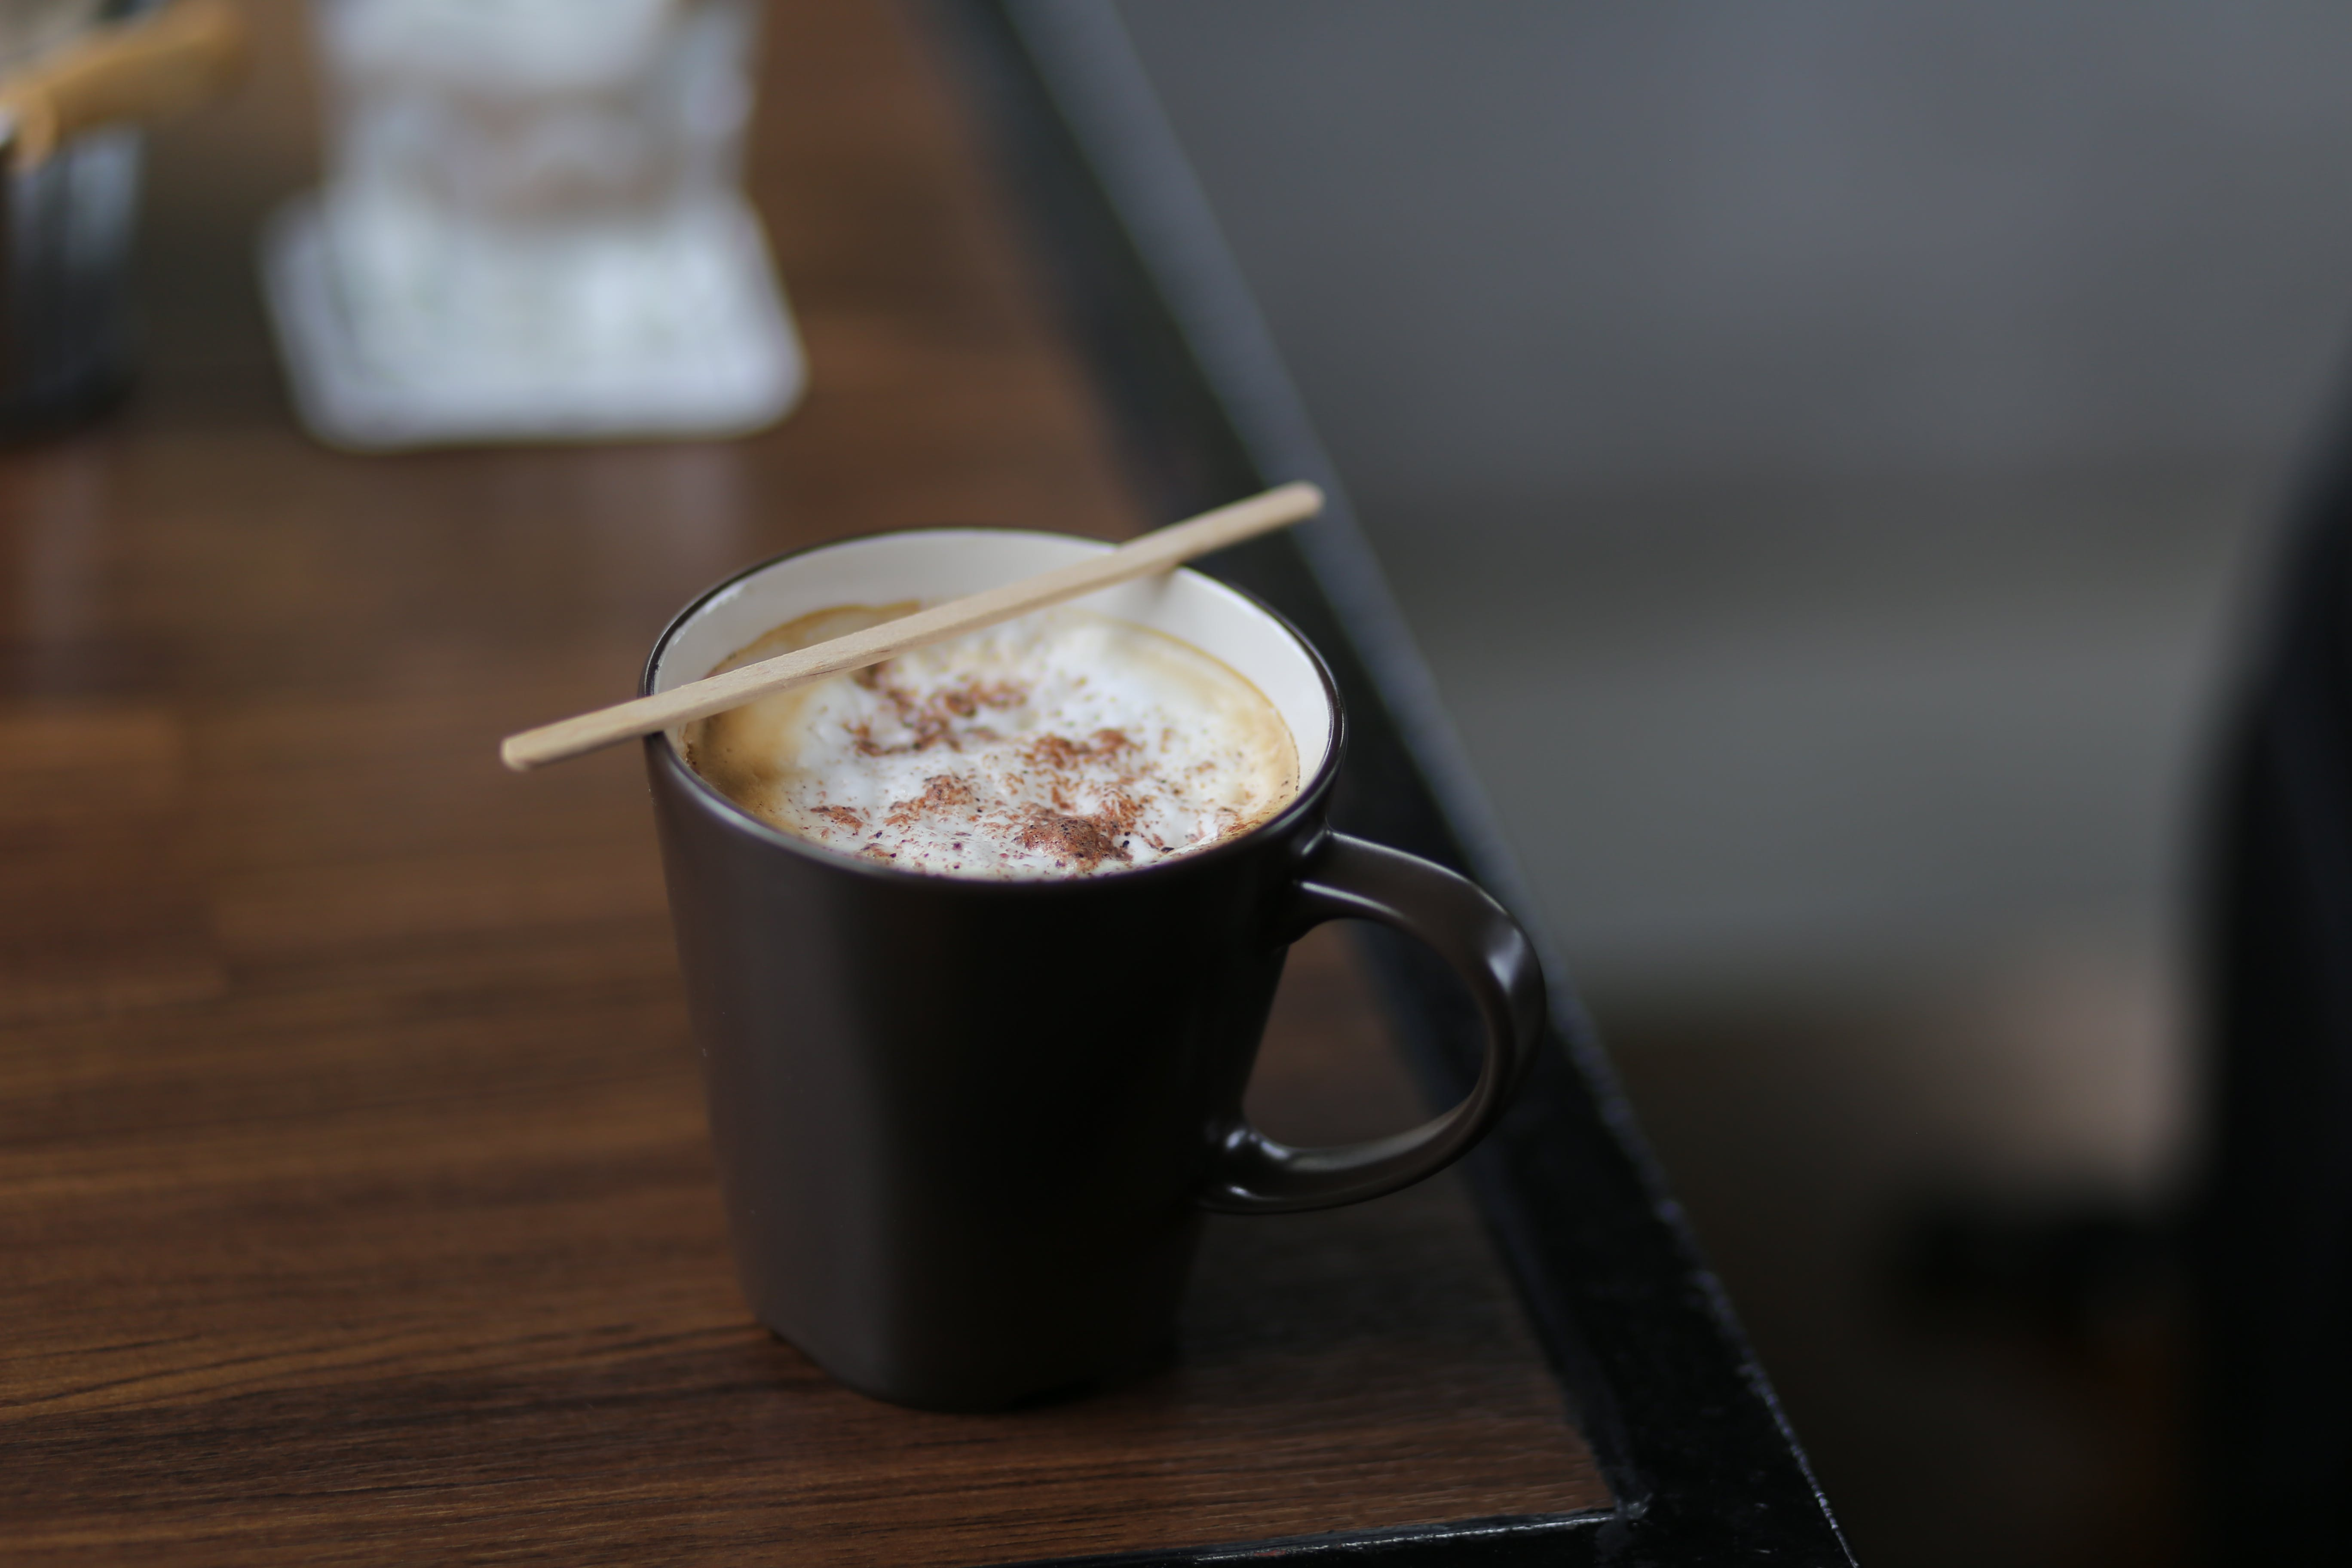 Free stock photo of coffee, coffee cup, coffee drink, coffee table